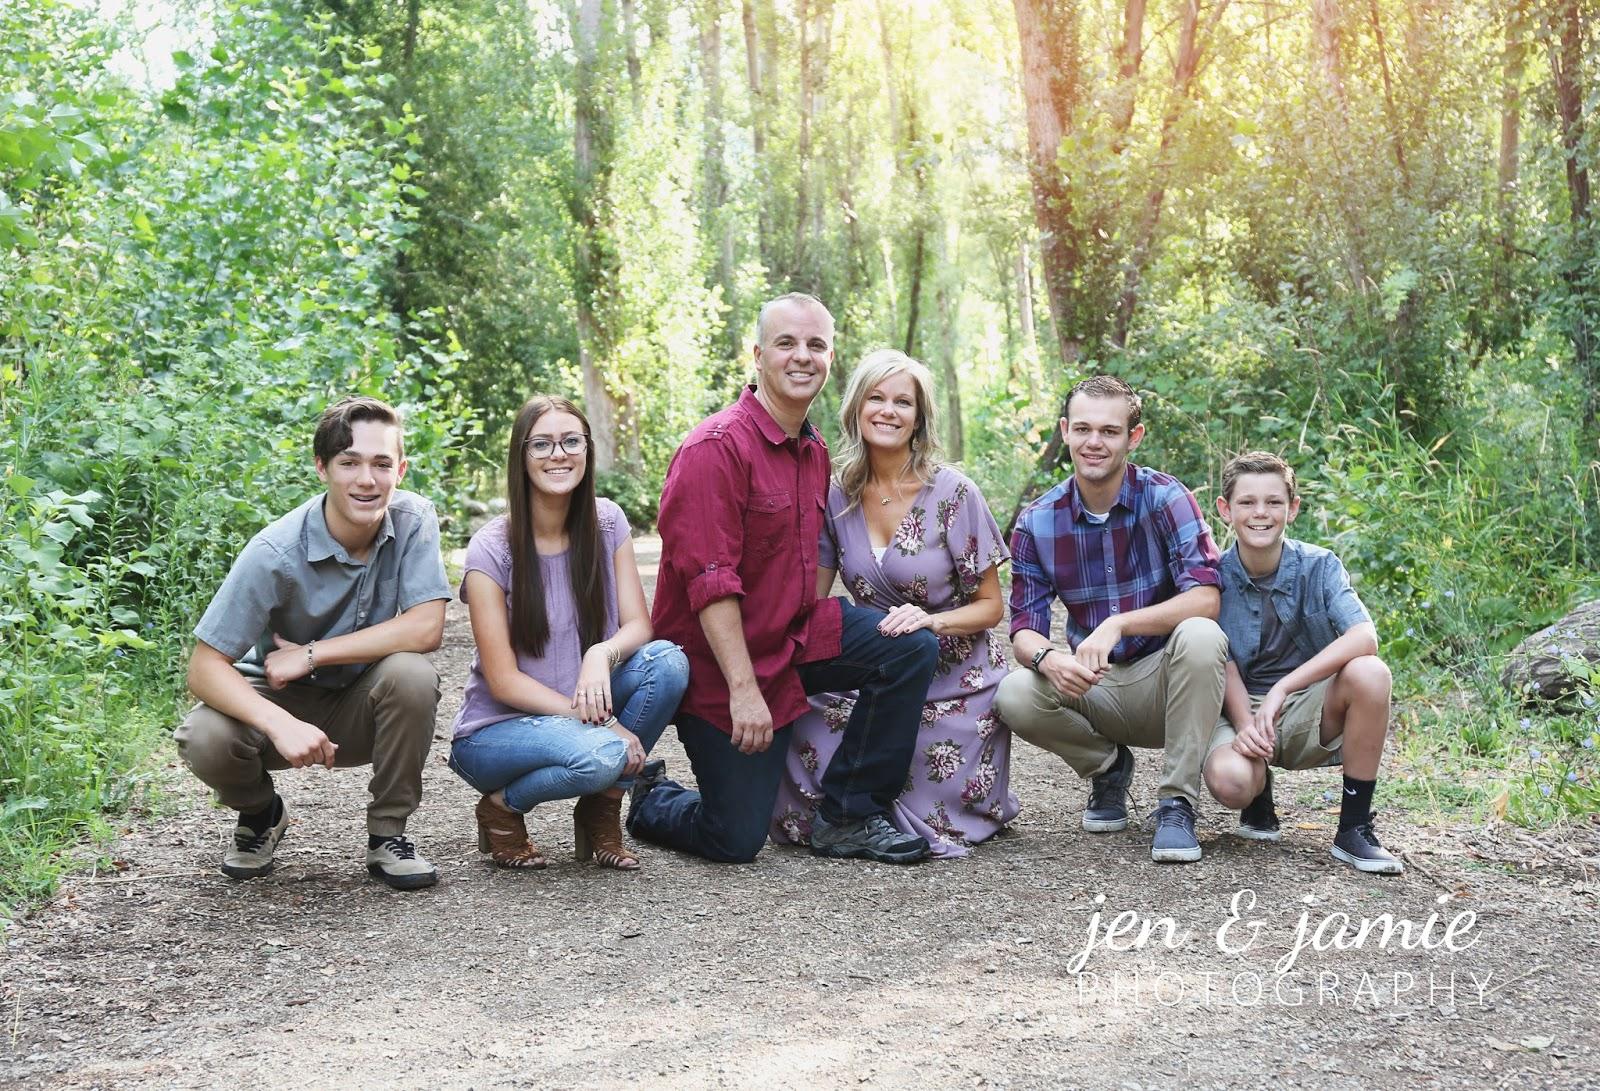 J&J Photography: {C Family} Davis County Layton Family Photographer